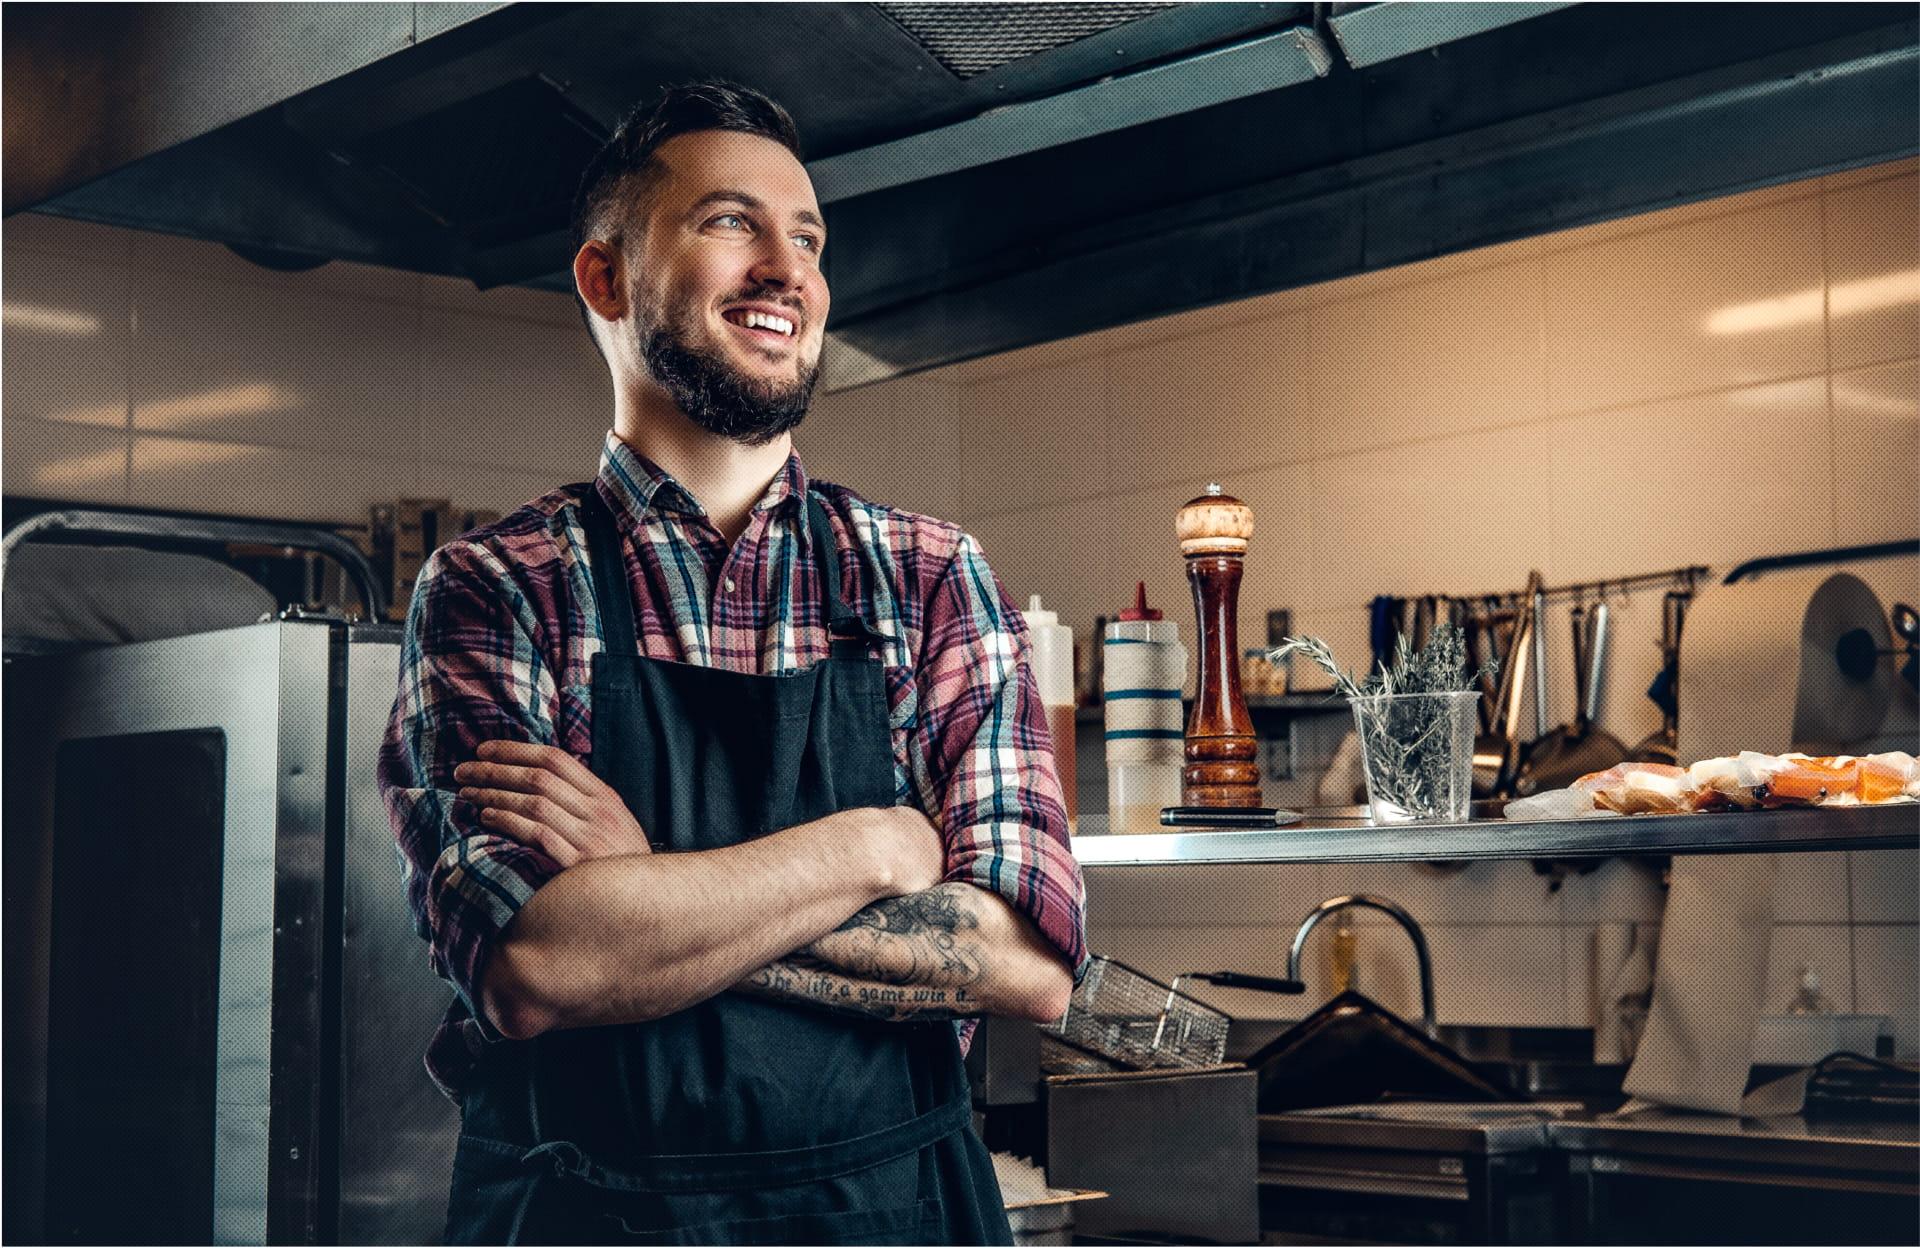 Butcher in the kitchen